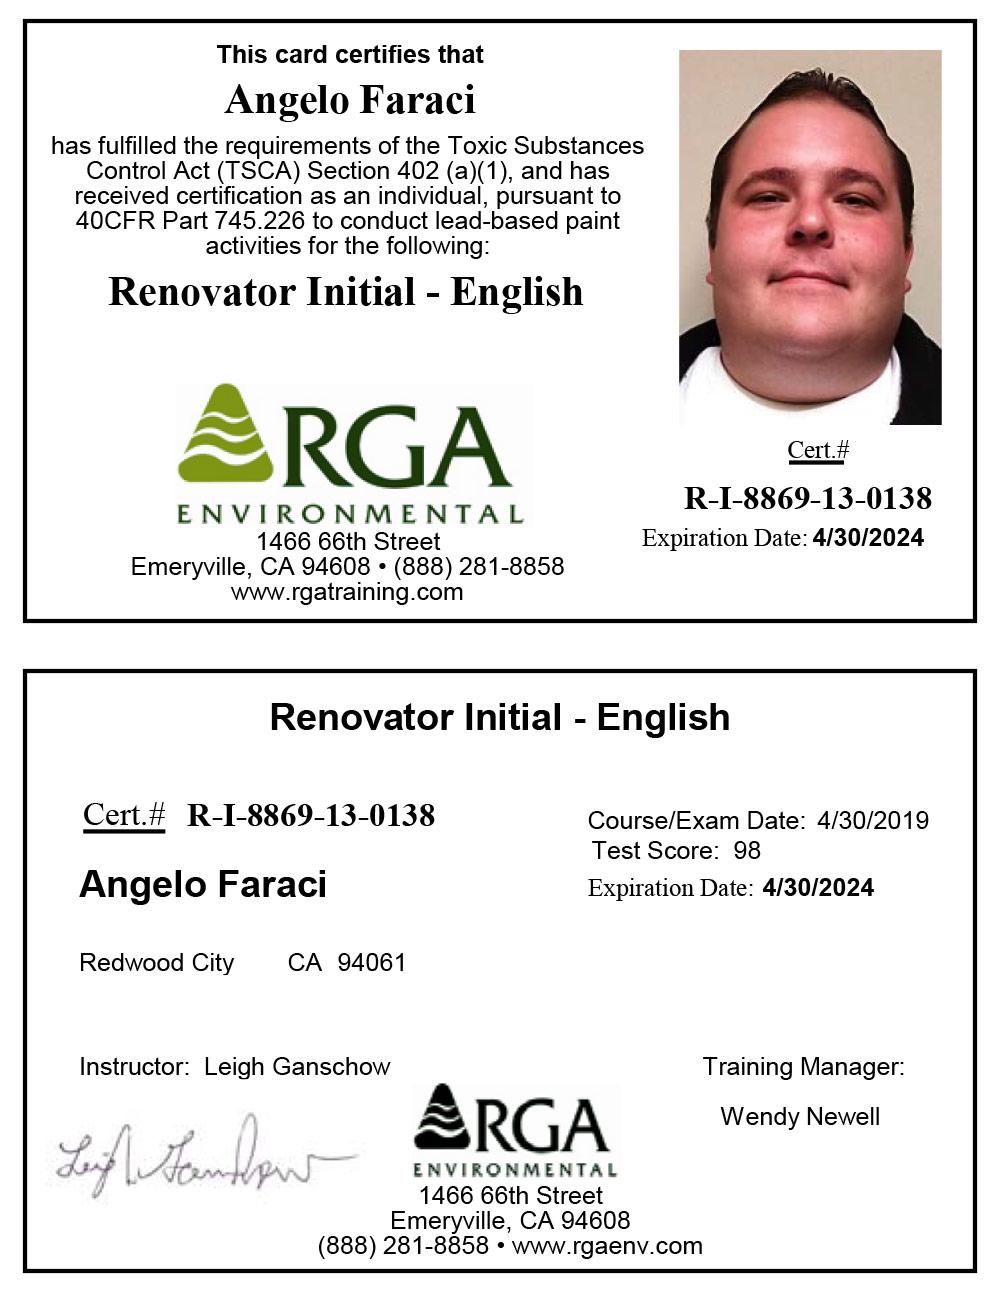 LRRP Certification